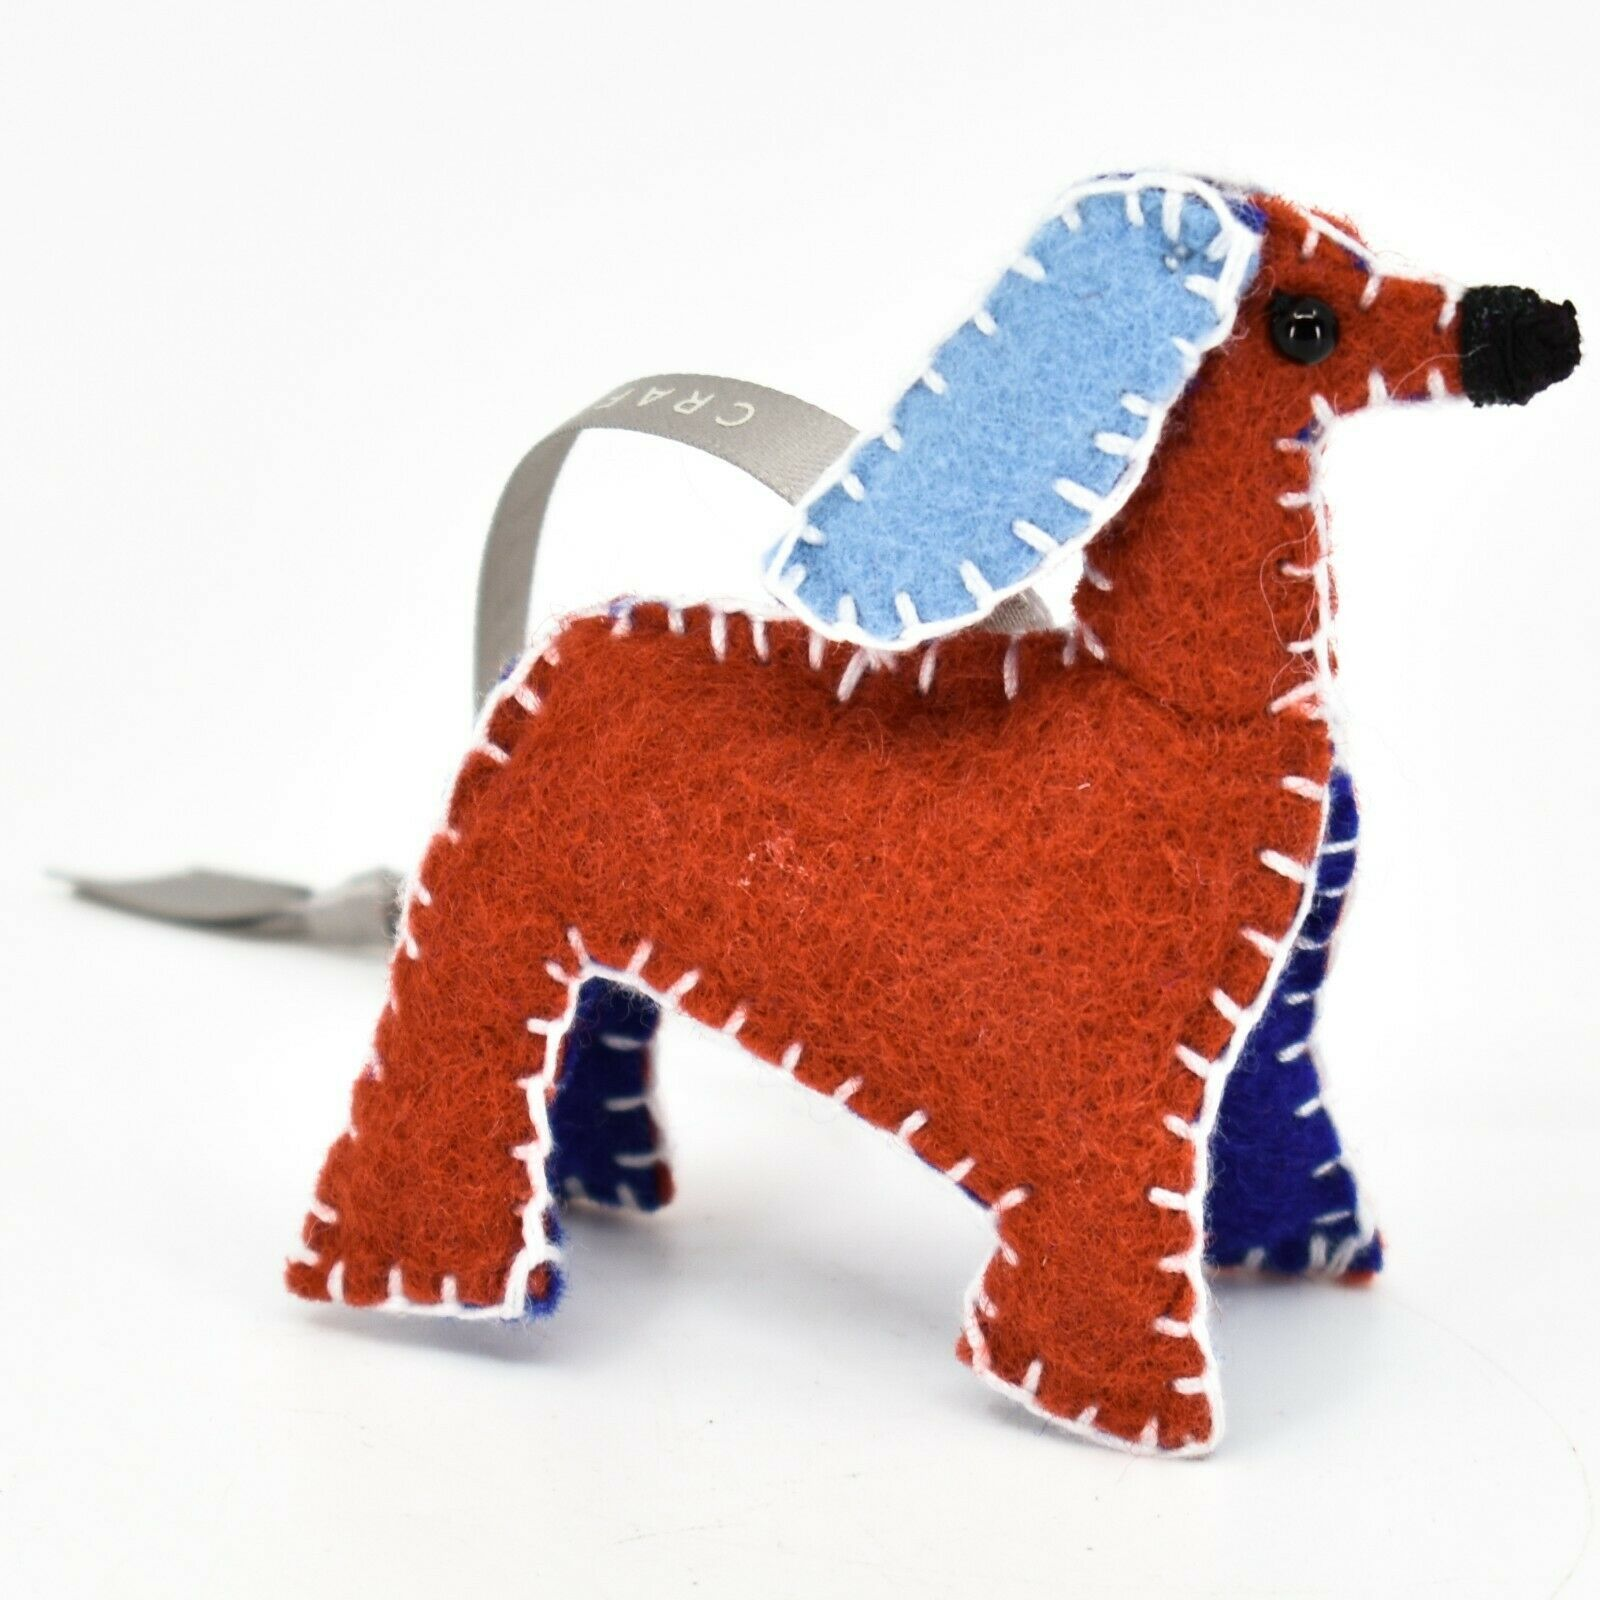 Made 51 Handcrafted Afghan Hound Dog Felt Ornament Refugee Malaysia Folk Art